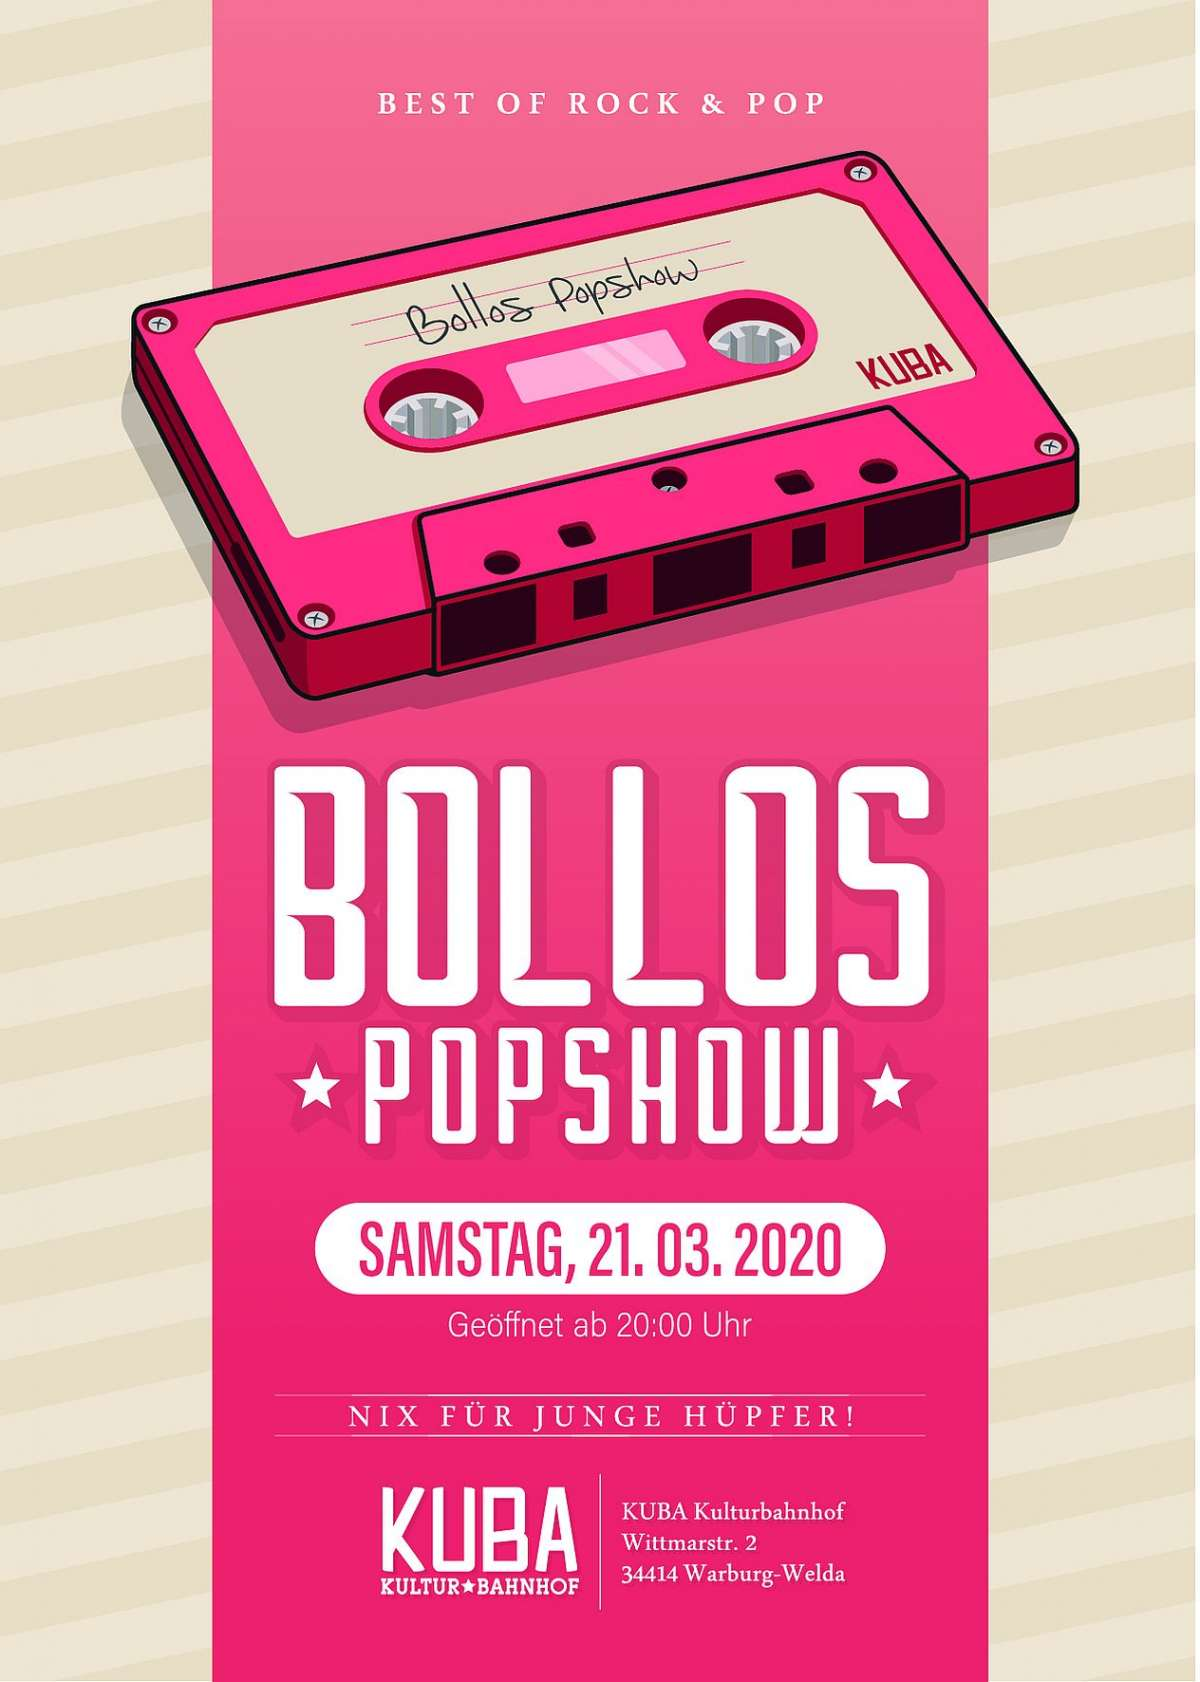 Veranstaltungen & Events Genre »Pop« in deiner Nähe...